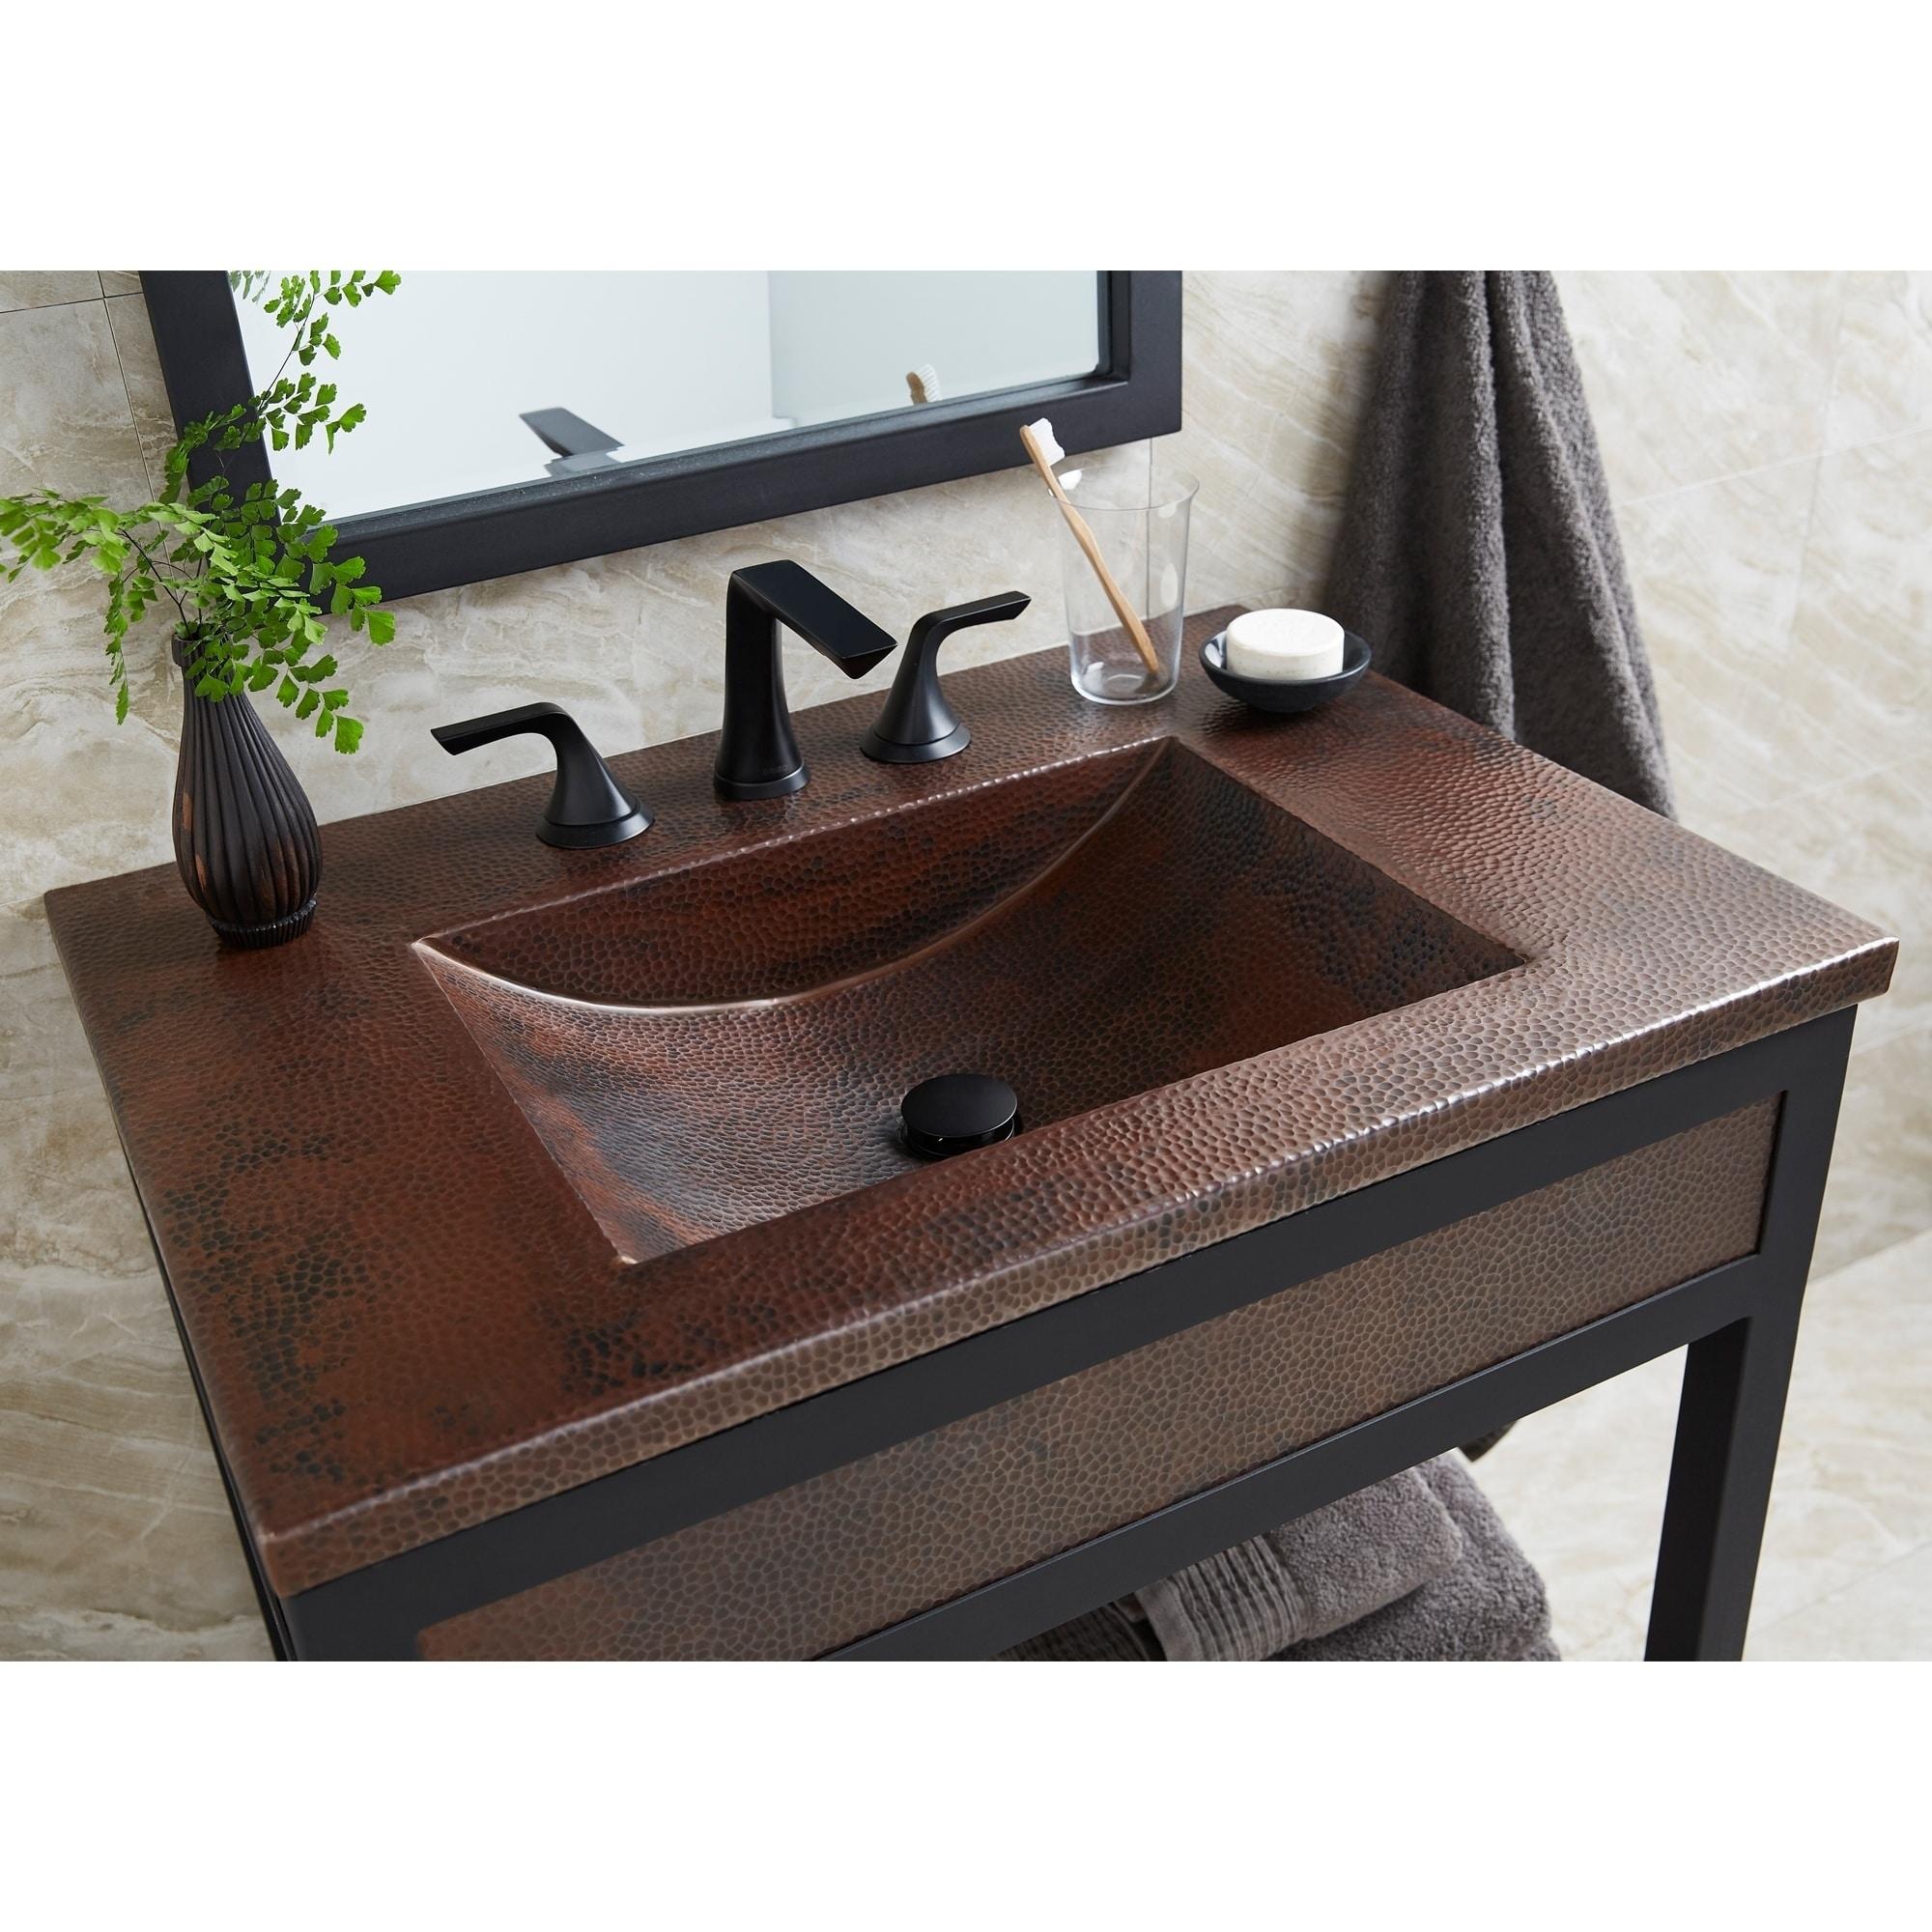 Cozumel Vanity Top With Integral Bathroom Sink In Antique Copper Top Only Overstock 27617709